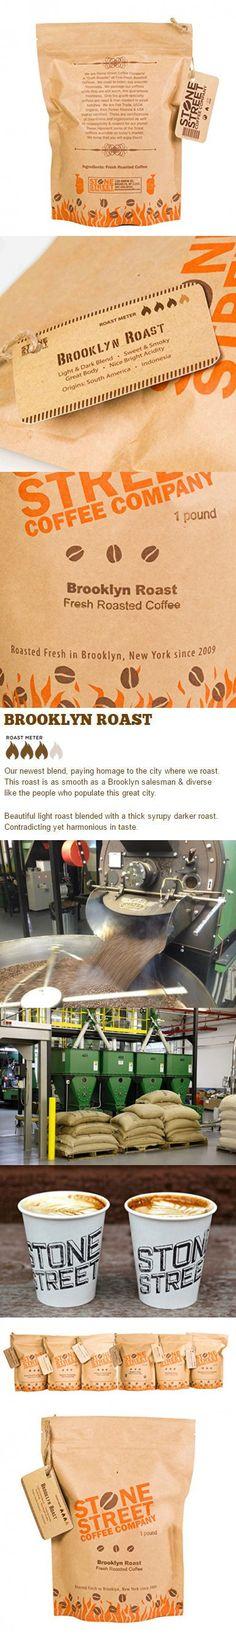 Stone Street Coffee Medium-Dark Roasted Brooklyn Signature Blend Freshly Ground Coffee with Resealable Bag, 1 lb.